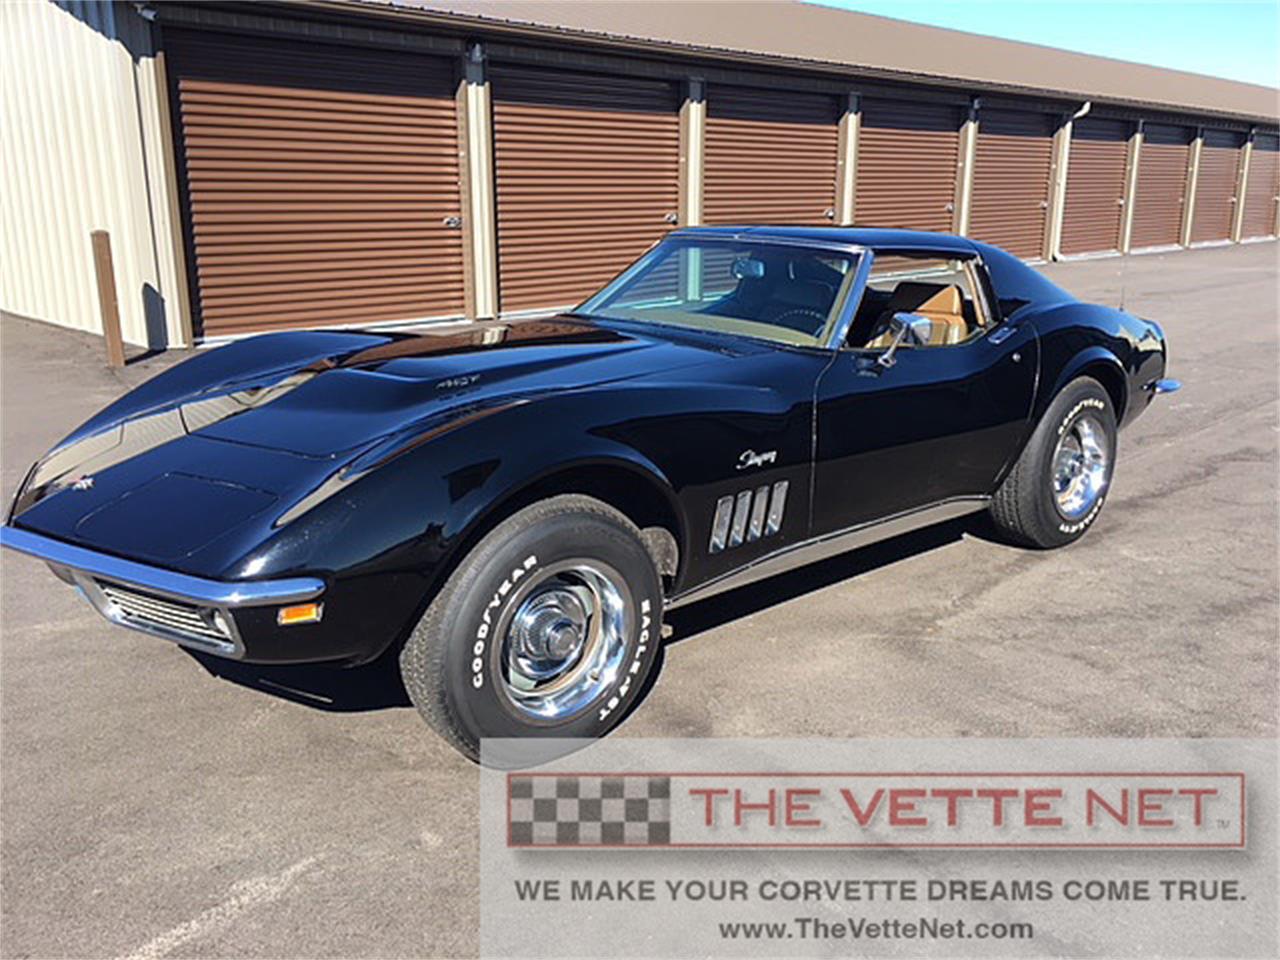 Kelebihan Kekurangan Chevrolet Corvette 1969 Top Model Tahun Ini